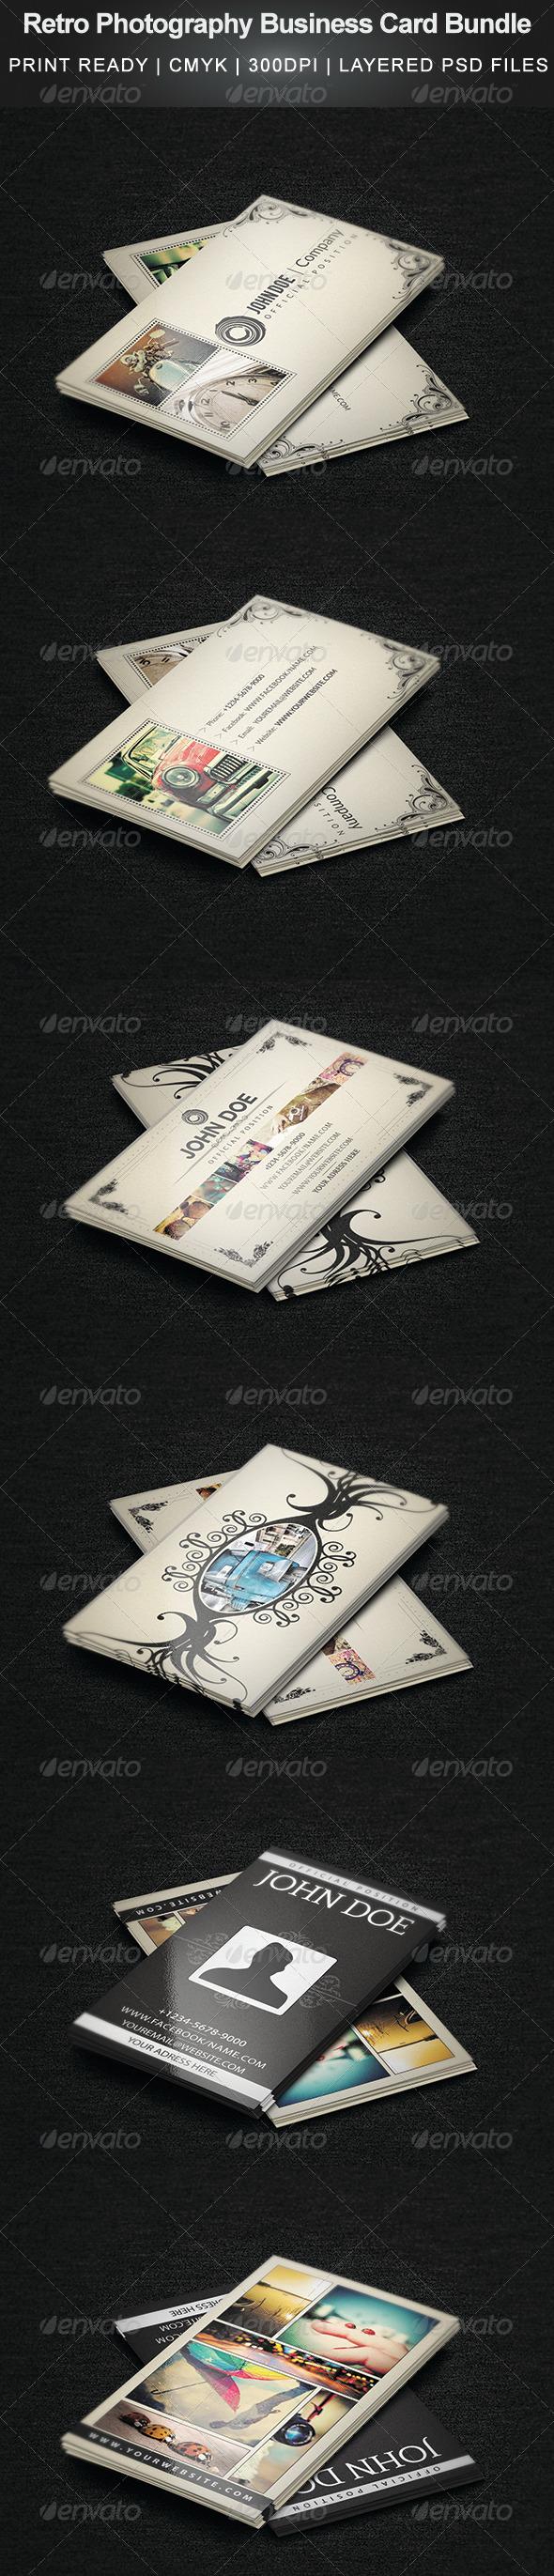 GraphicRiver Retro Photography Business Card Bundle 4658922